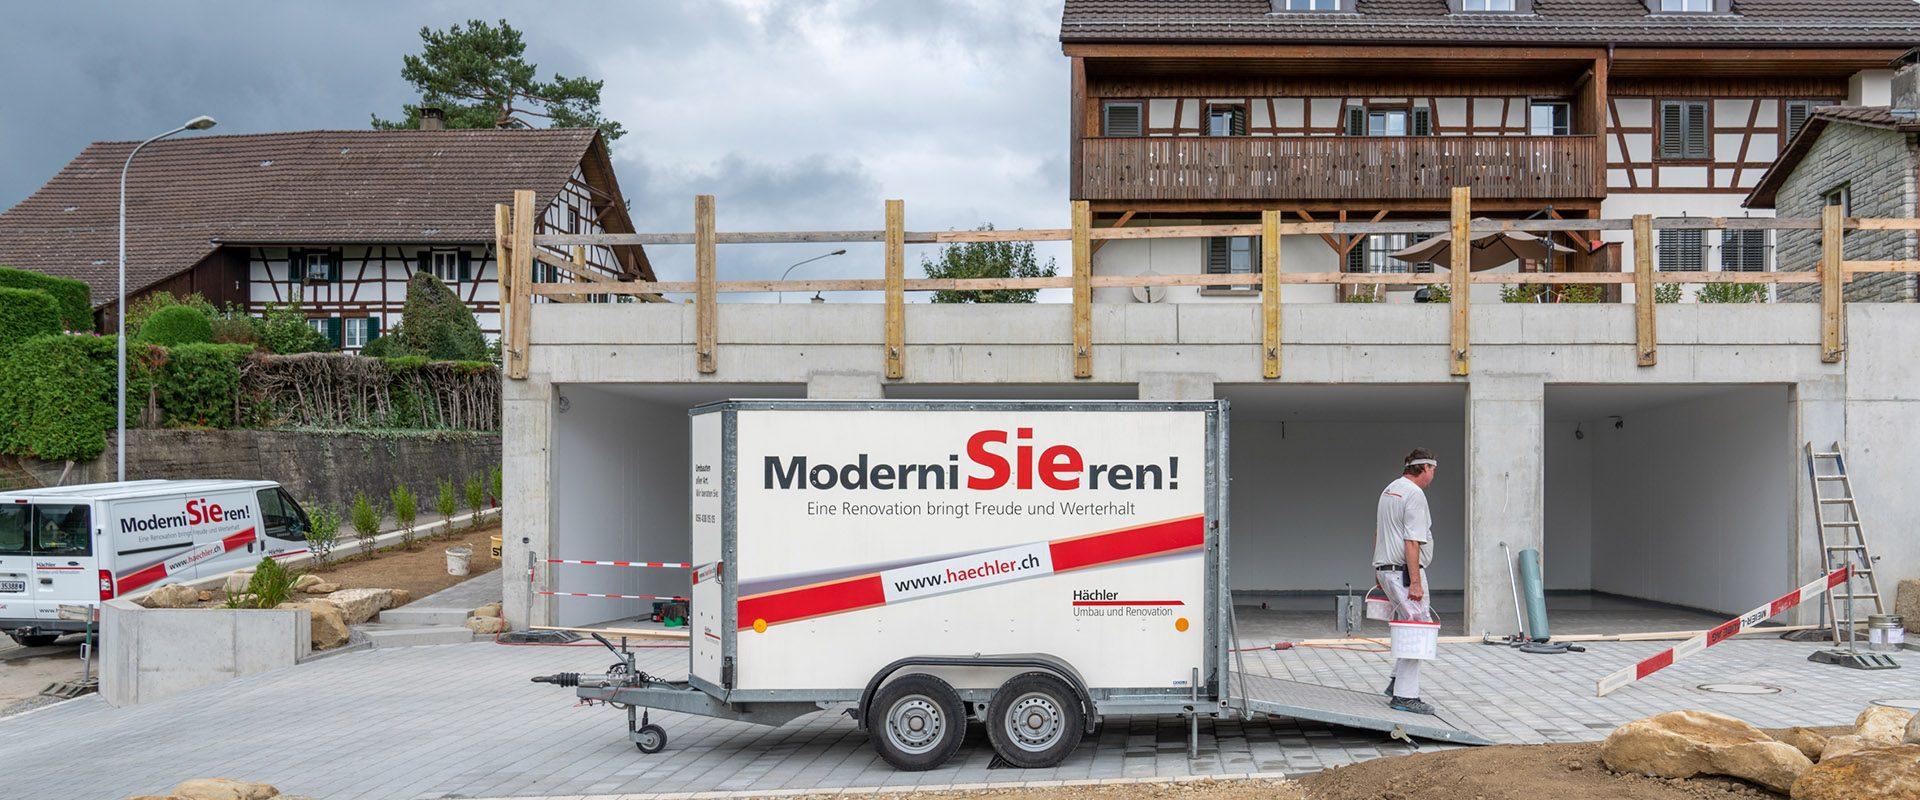 Hächler Umbau, Renovation, Modernisierung